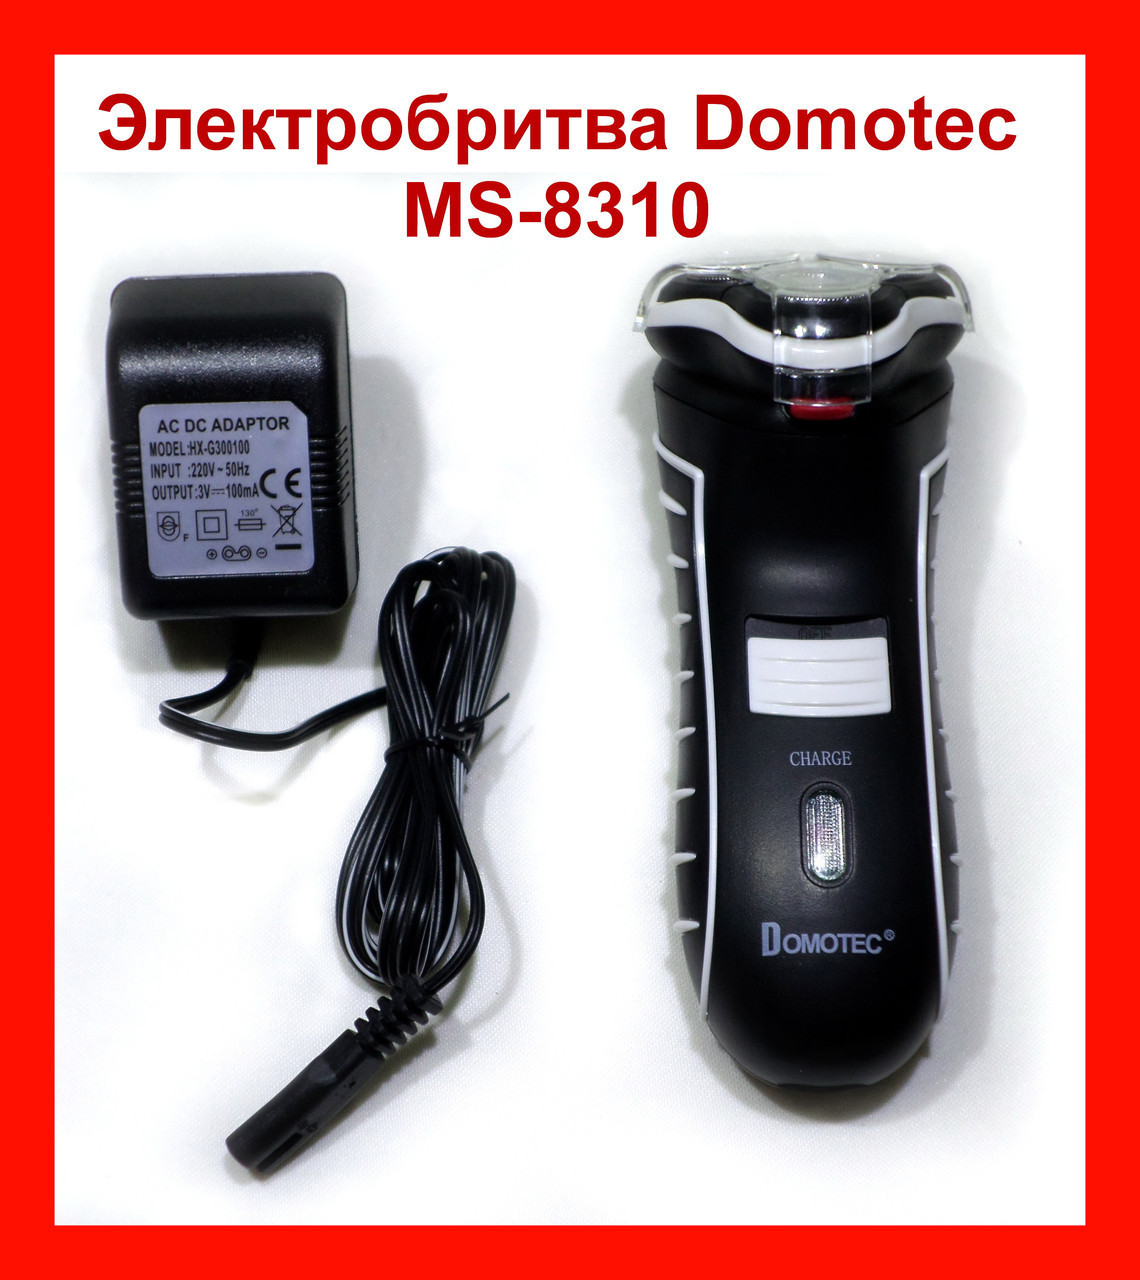 Аккумуляторная Электробритва Domotec MS-8310 Бритва C